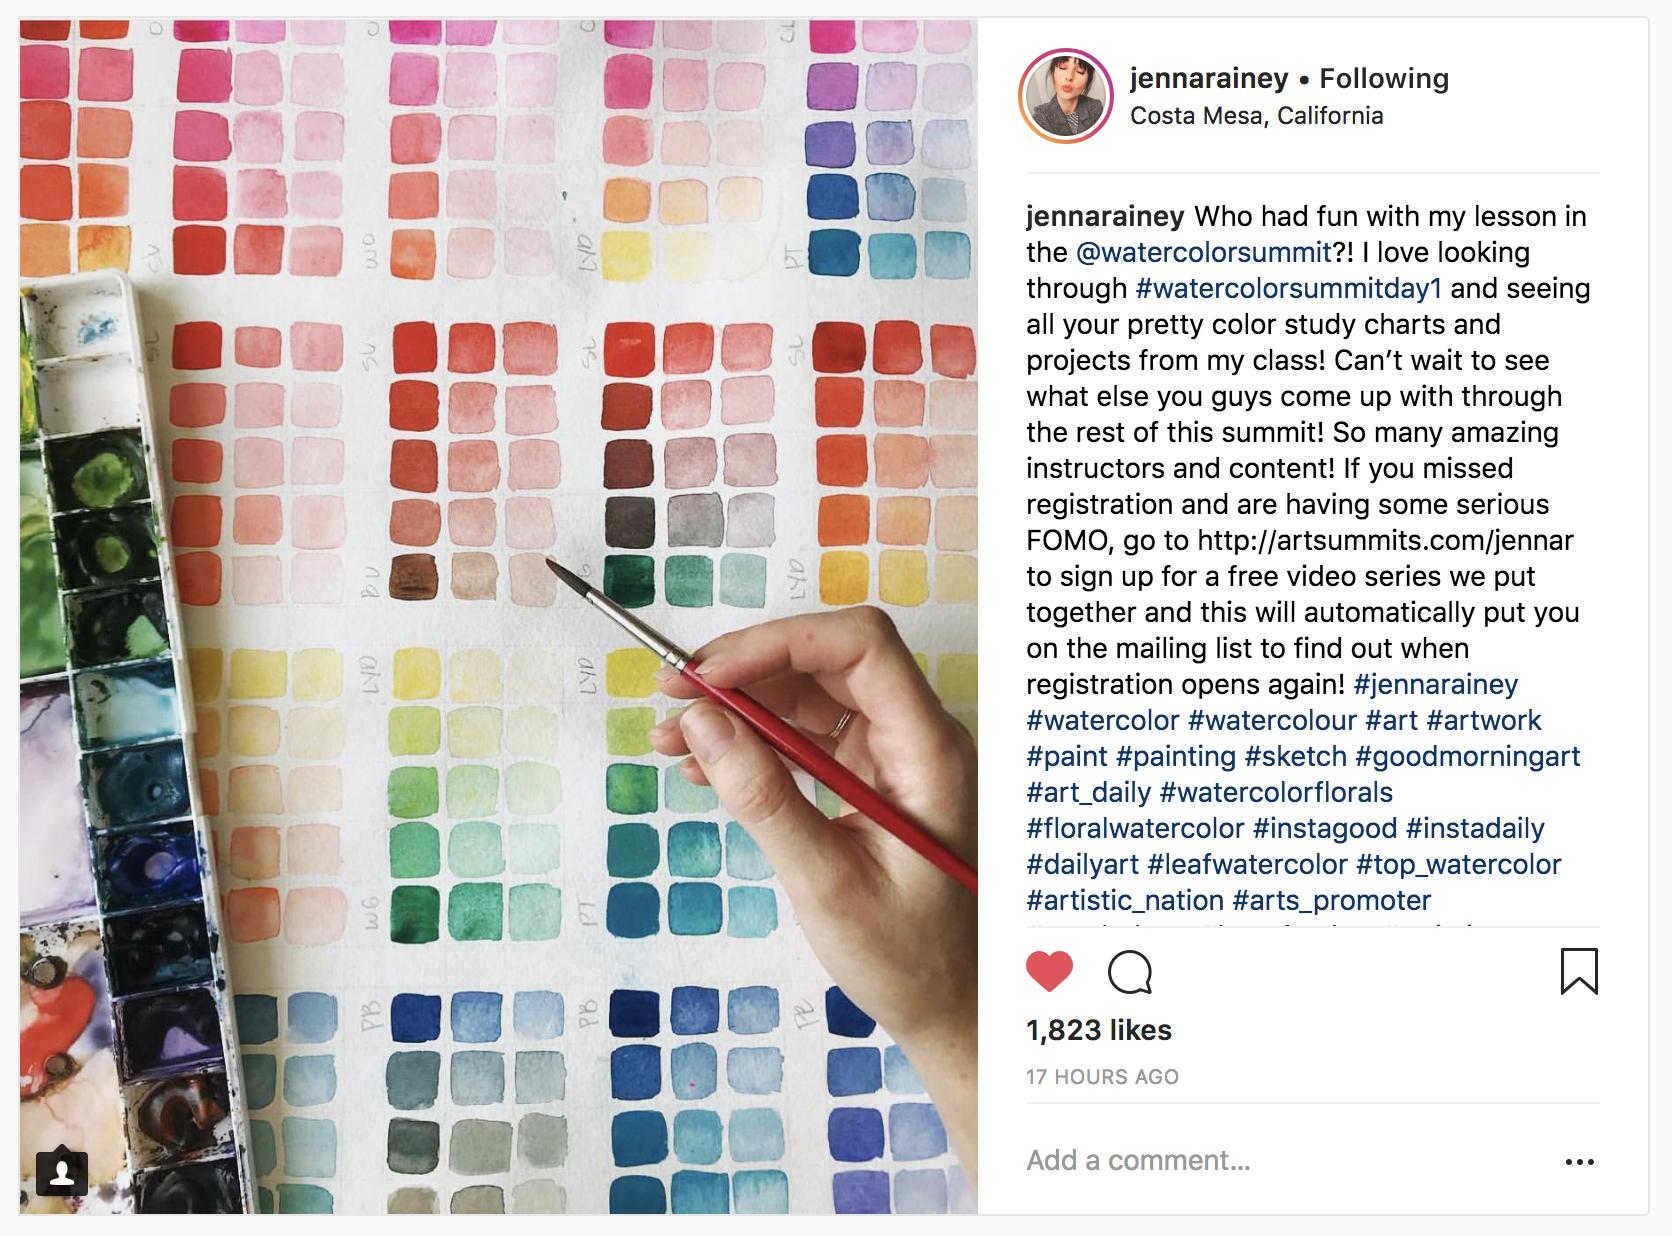 10 Watercolor Artist Inspiration Accounts to Follow: jennarainey